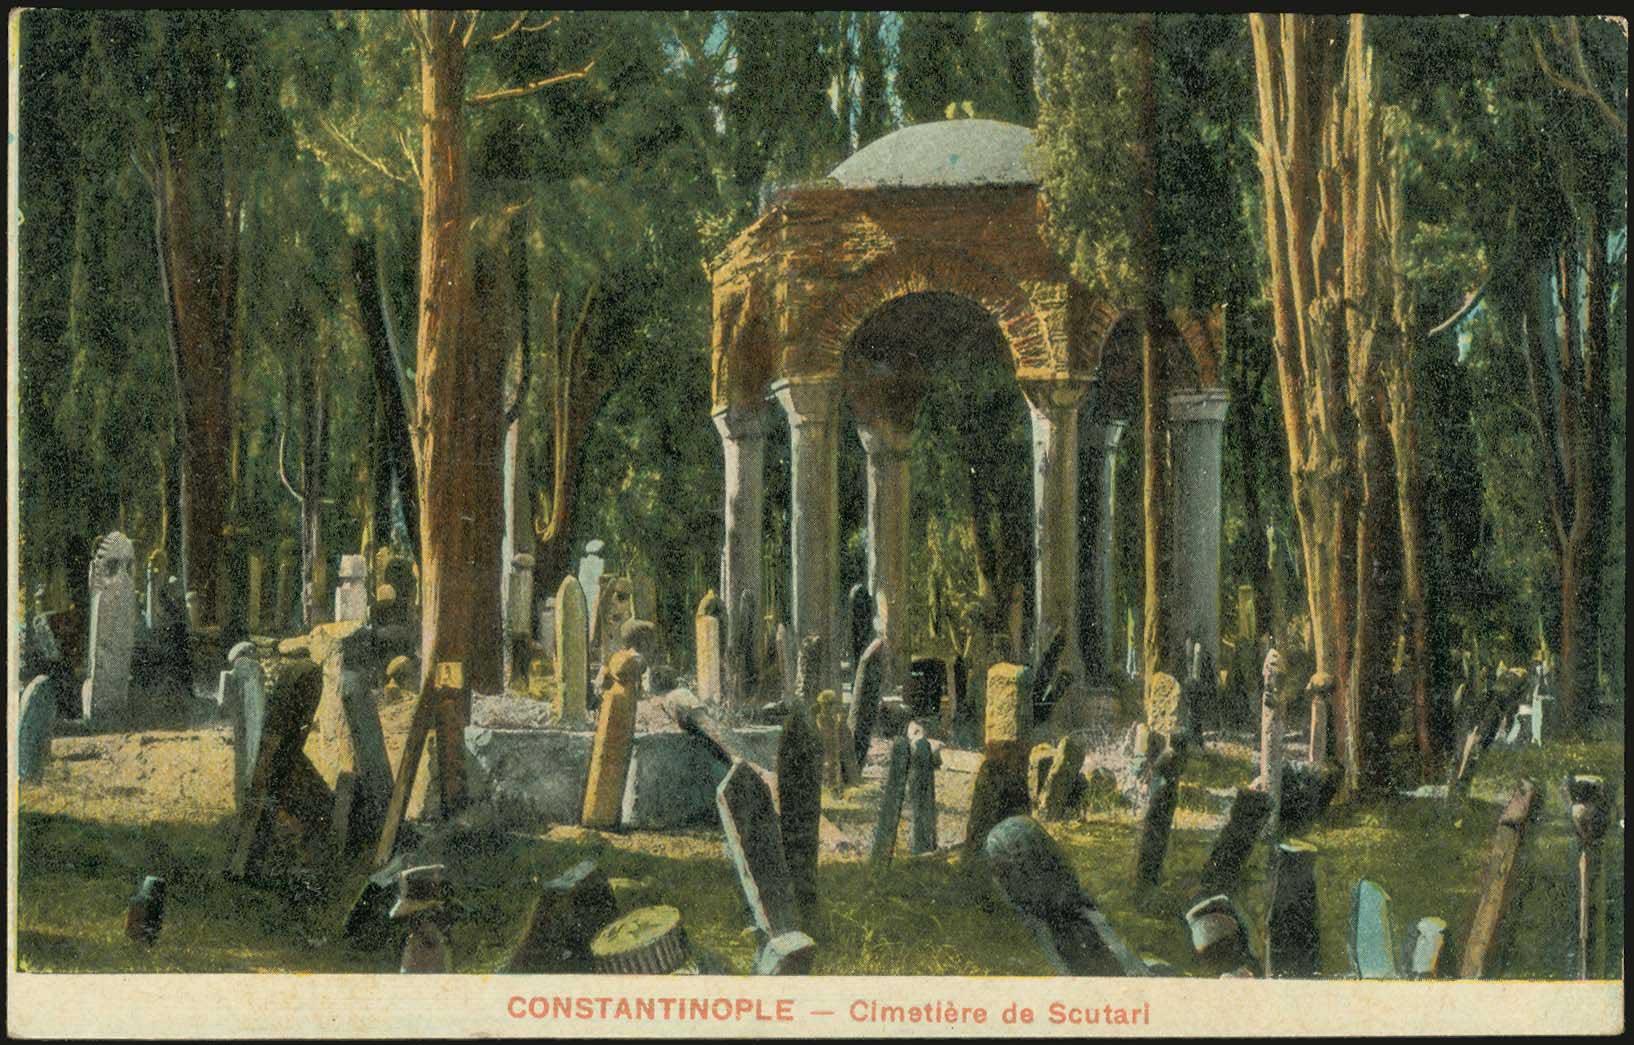 Lot 1759 - -  PICTURE POSTCARDS SMYRNE, CONSTANTINOPLE, ASIA MINOR -  A. Karamitsos Public & Live Internet Auction 675